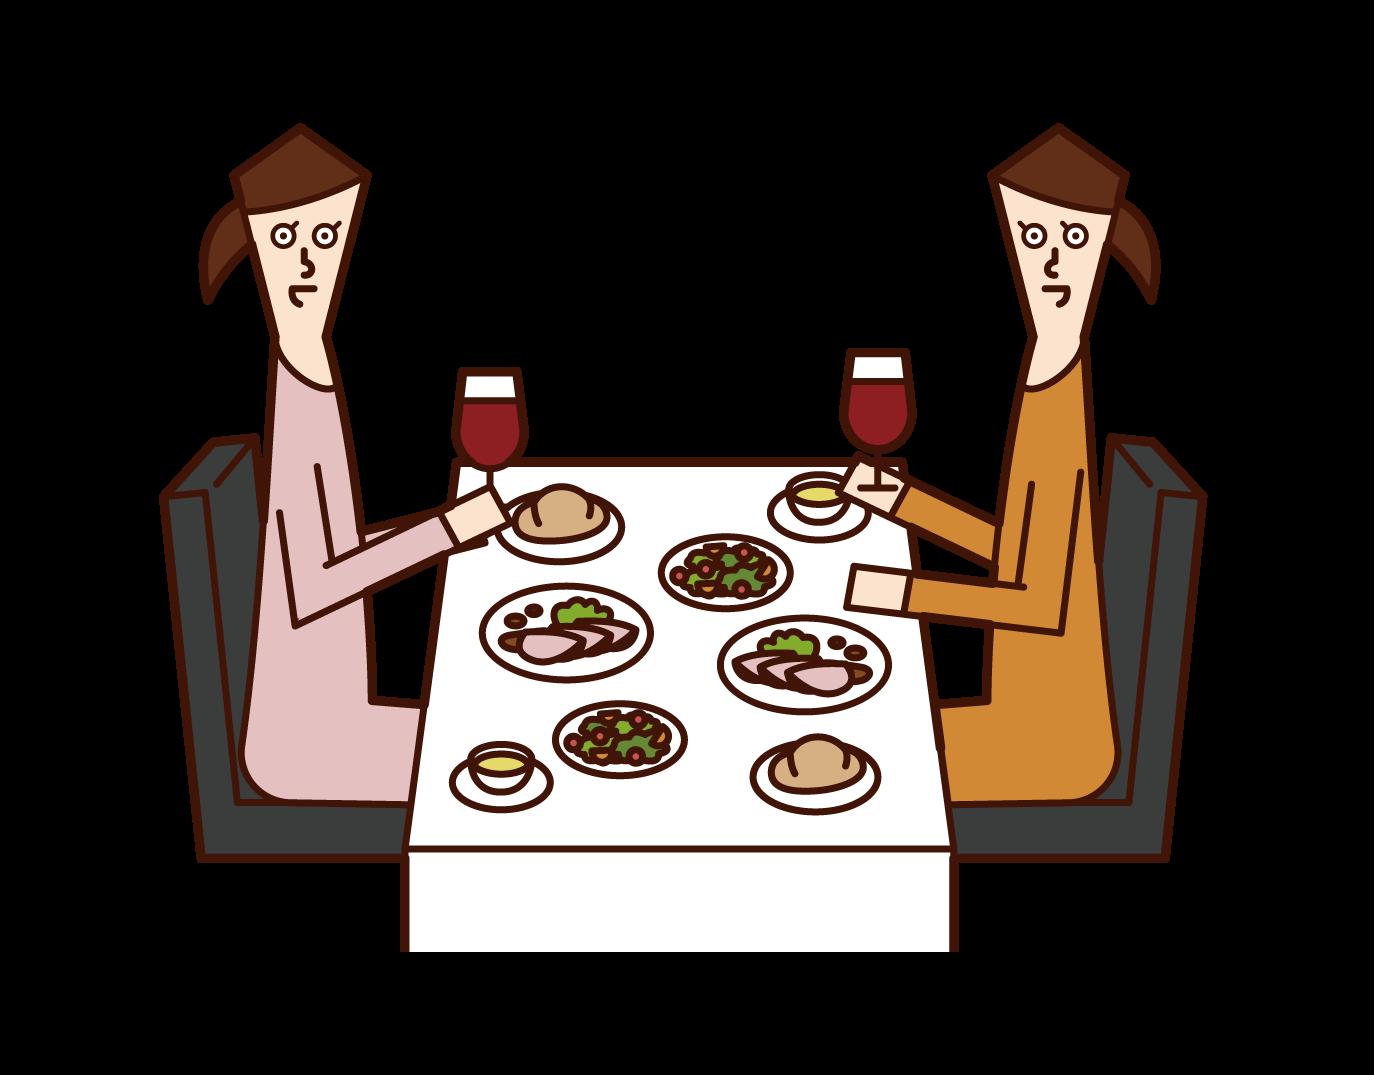 Illustration of people (women) eating dinner at a restaurant